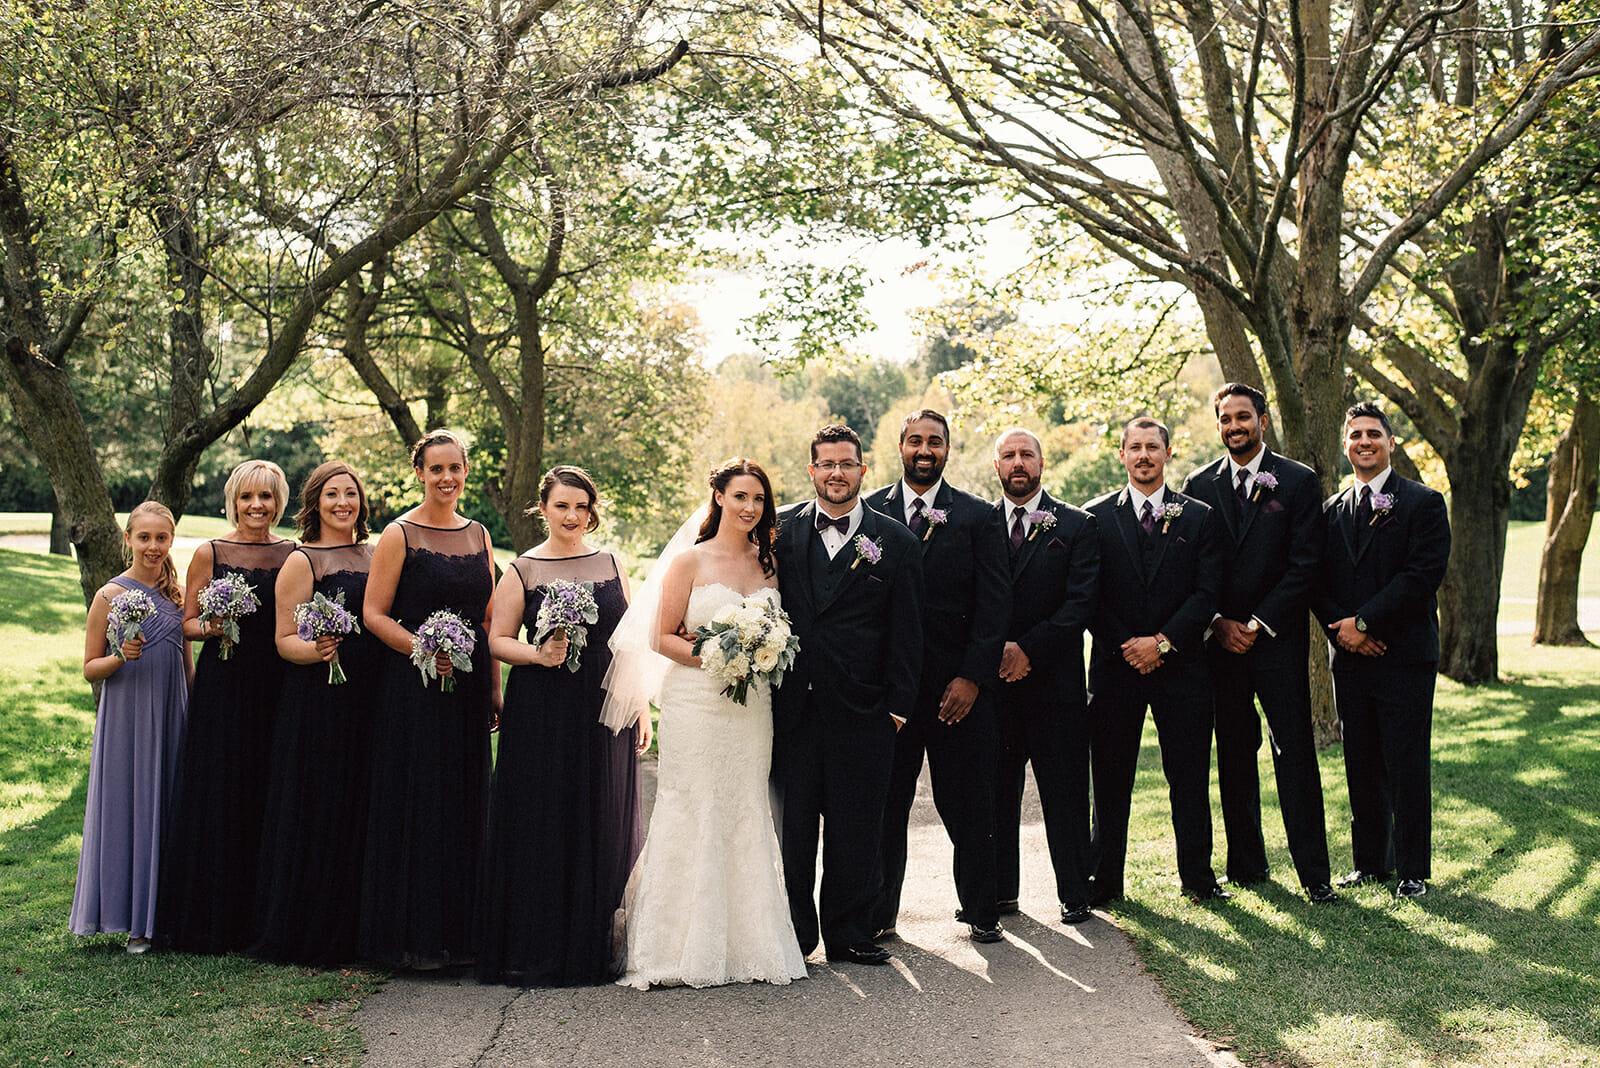 wedding party photos at kedron dells wedding venue oshawa